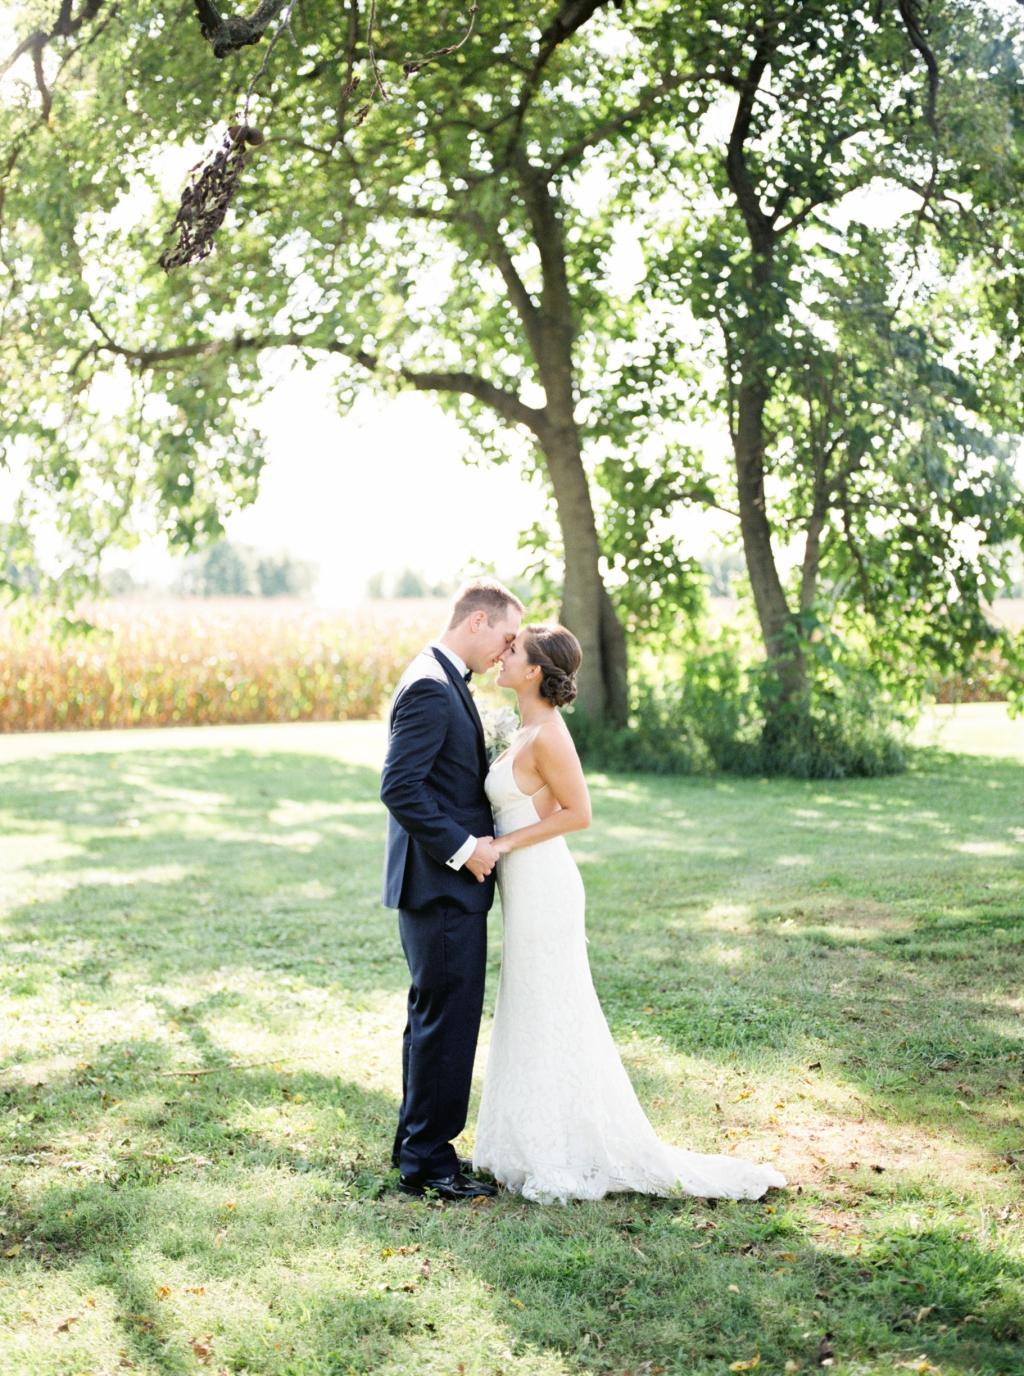 haley-richter-photography-buena-vista-confrence-center-wedding-summer-206